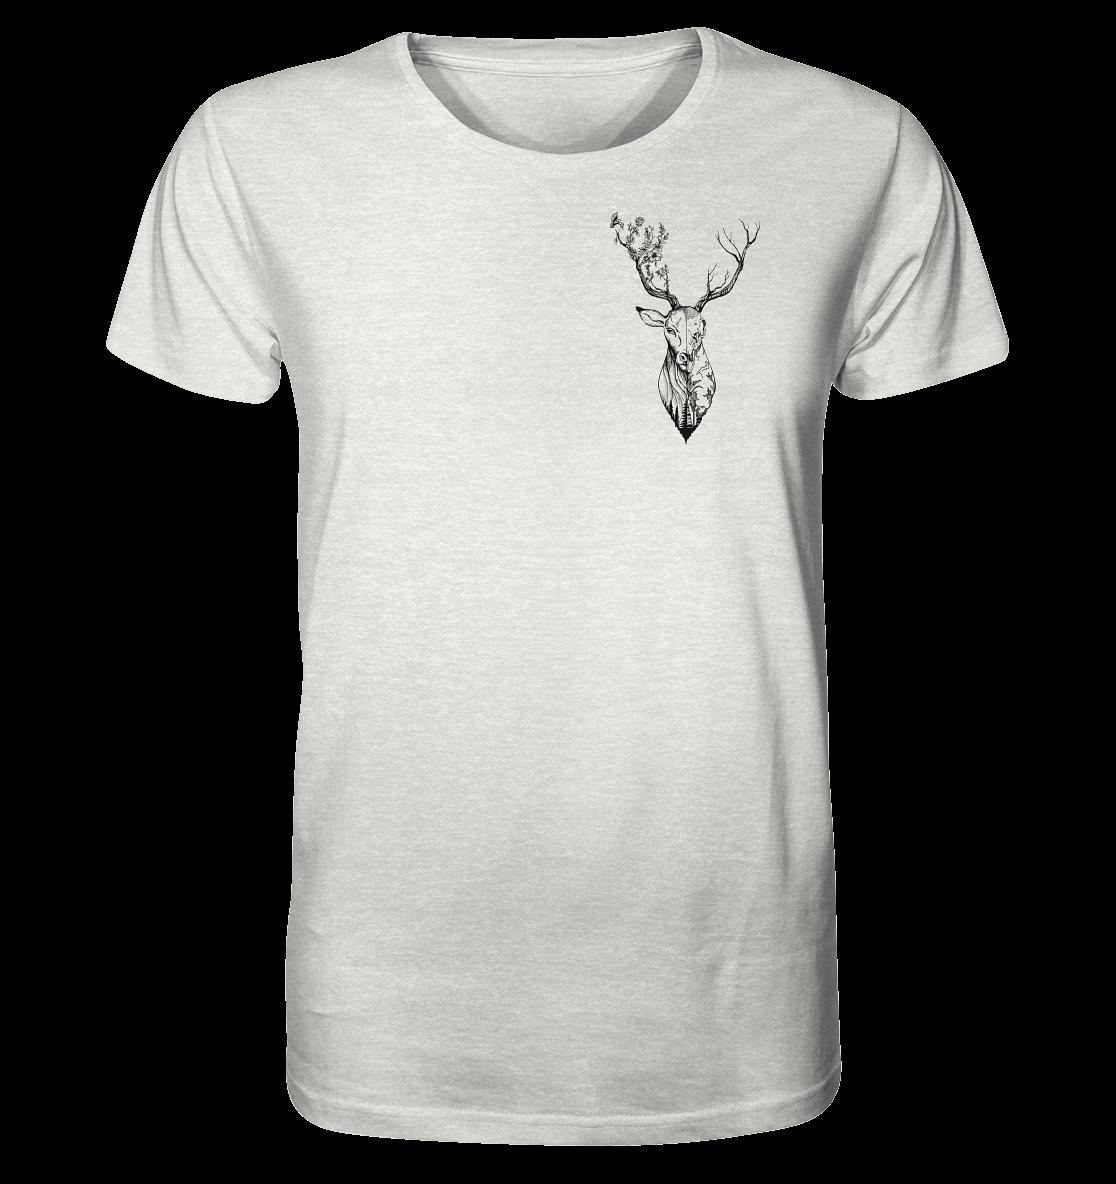 front-organic-shirt-meliert-f2f5f3-1116x-7.png